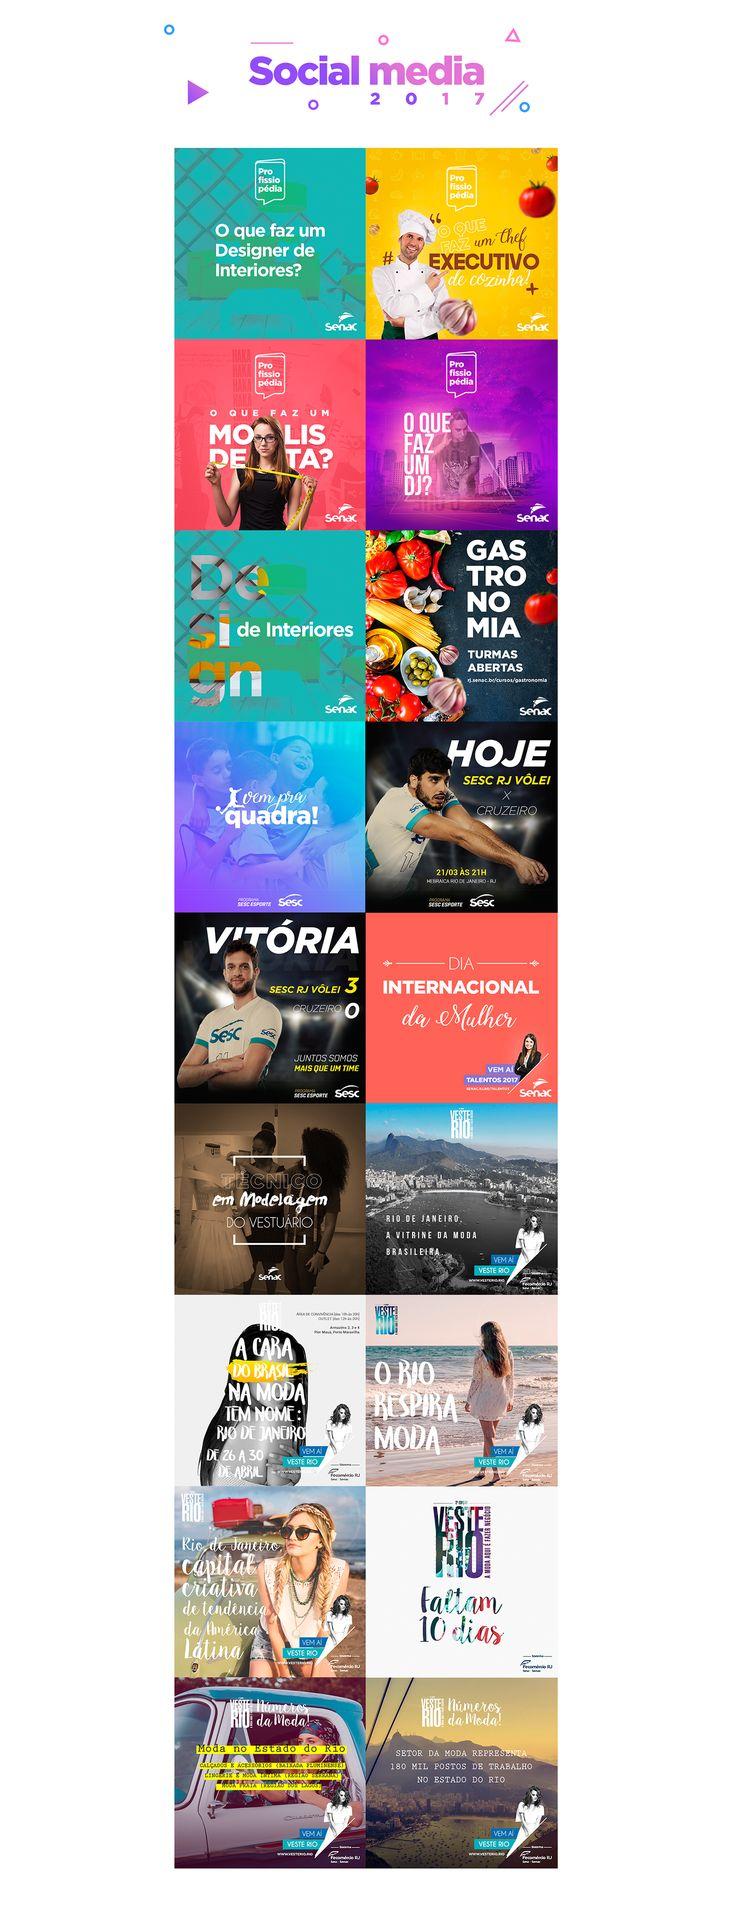 Echa un vistazo a este proyecto @Behance: u201cSocial Media 2017u201d https://www.behance.net/gallery/51996625/Social-Media-2017